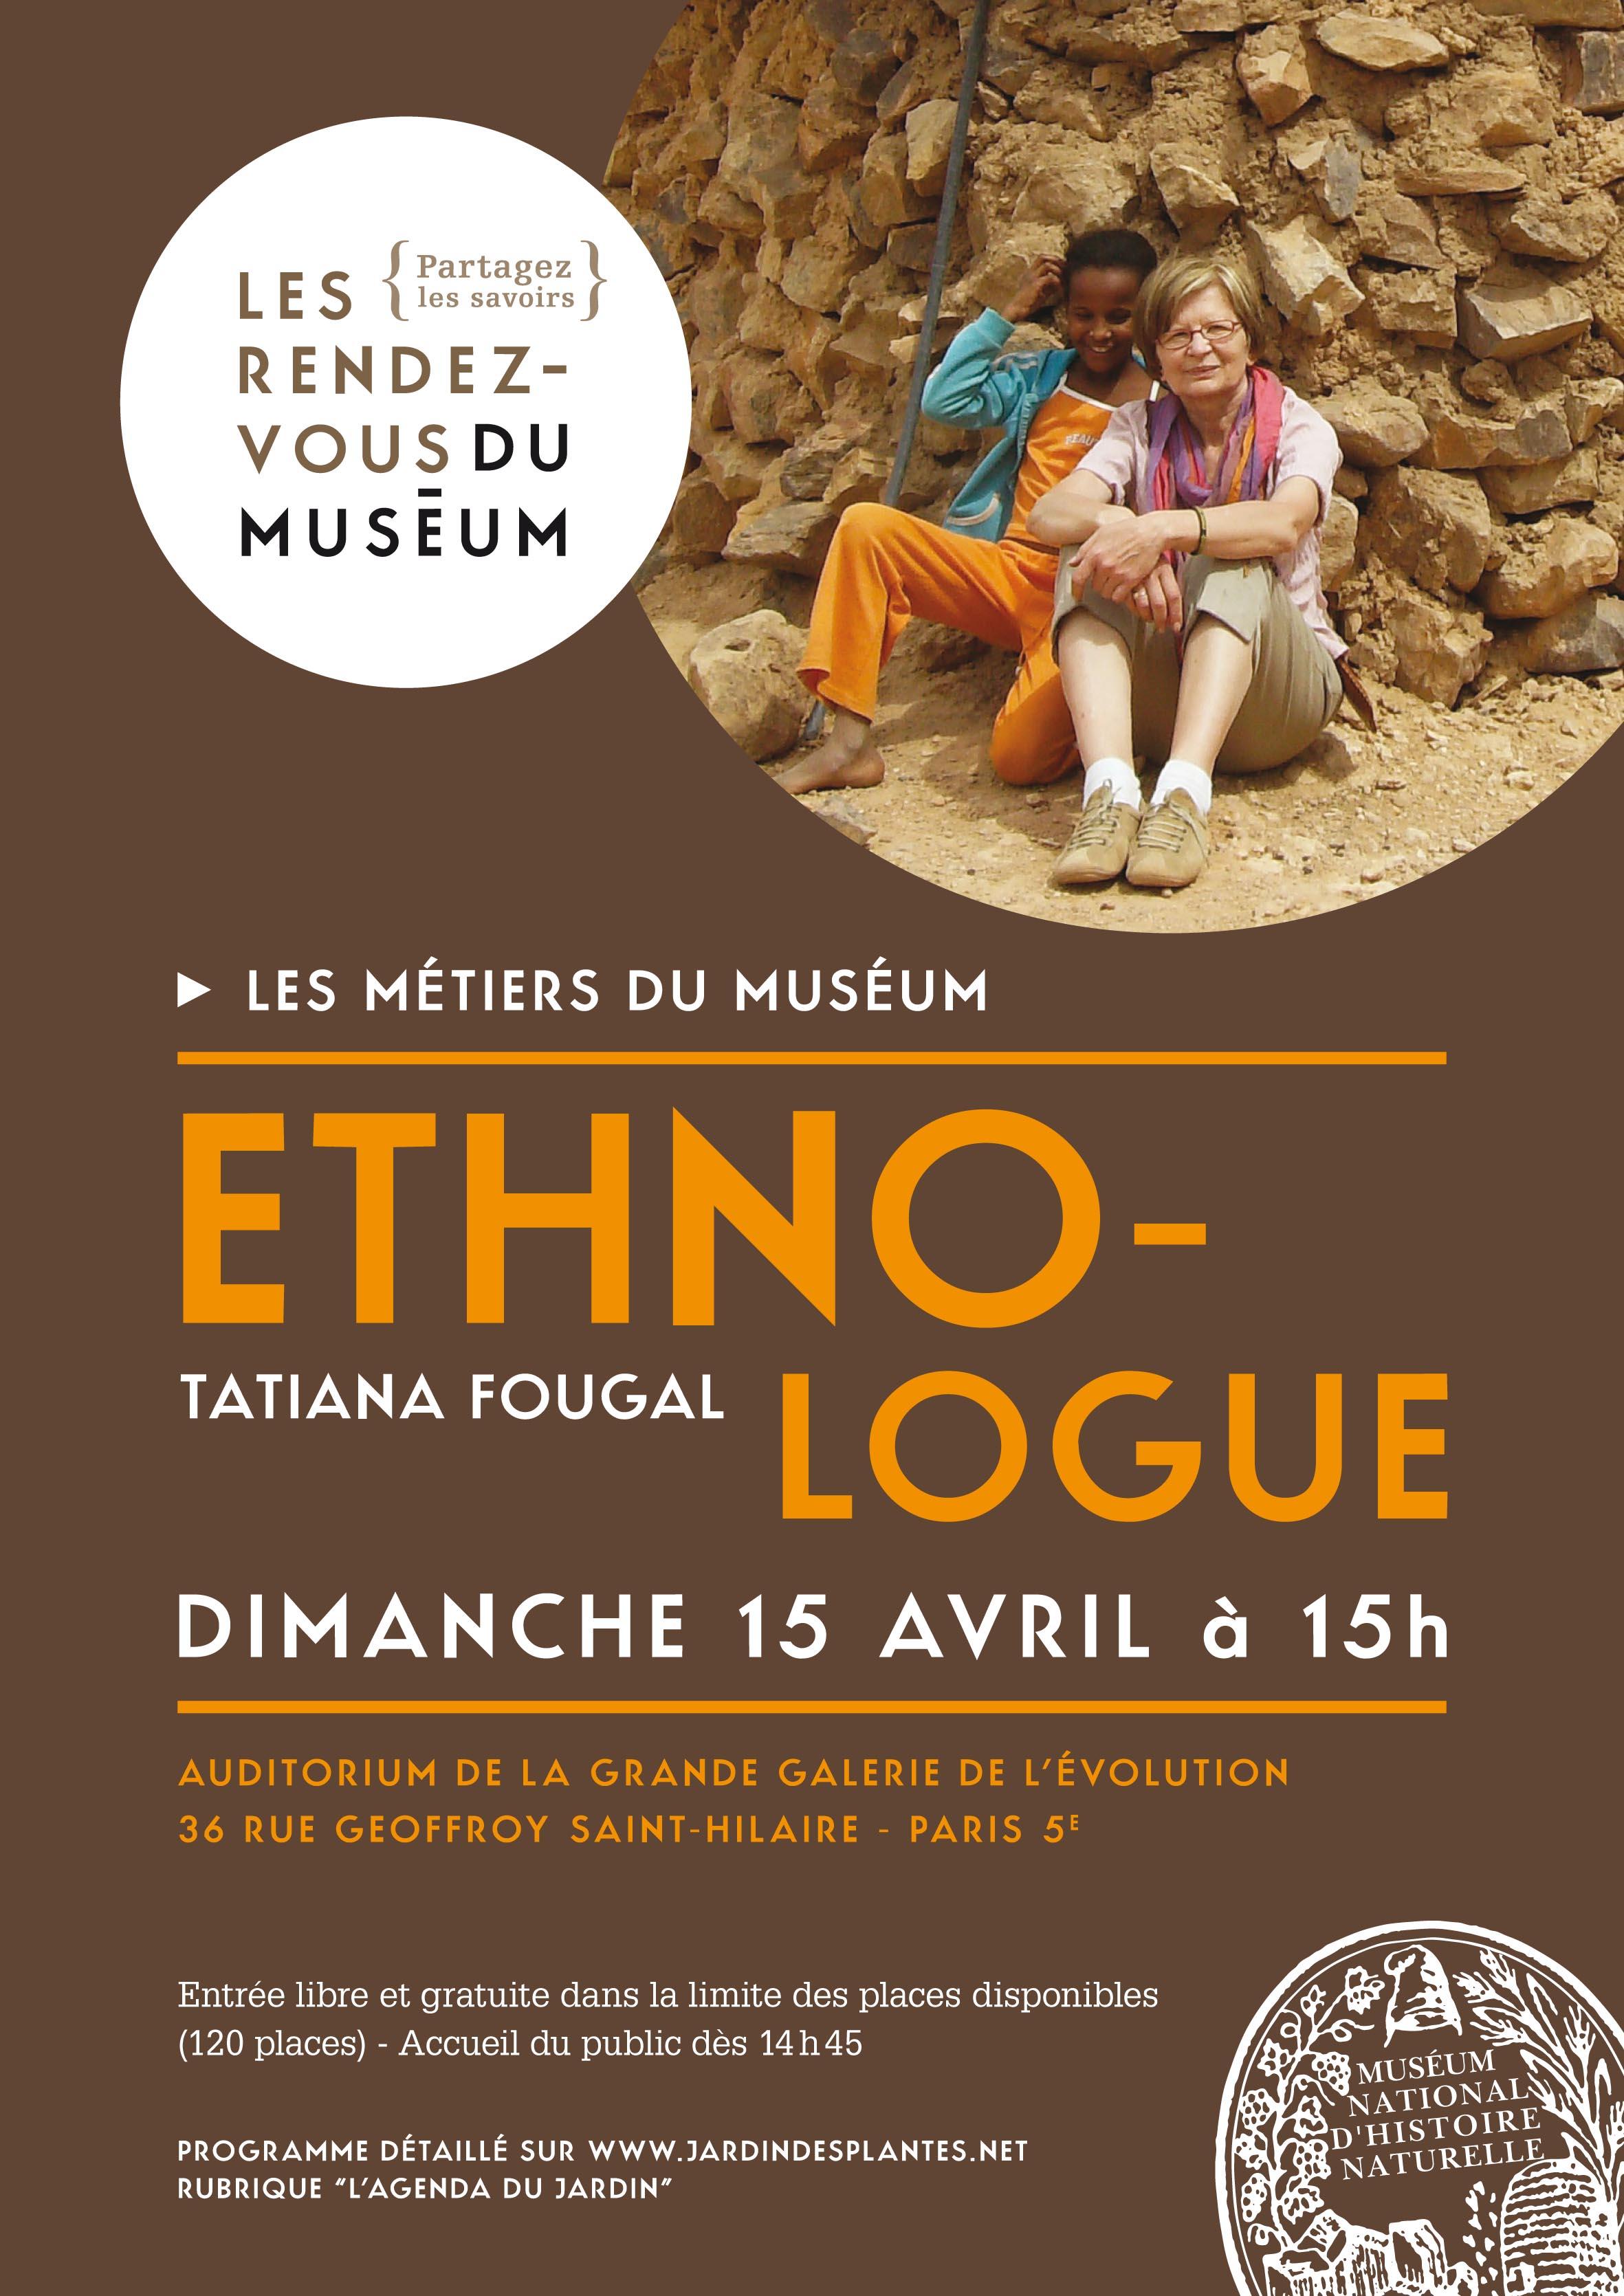 AFF-Métier-Ethnologue.indd